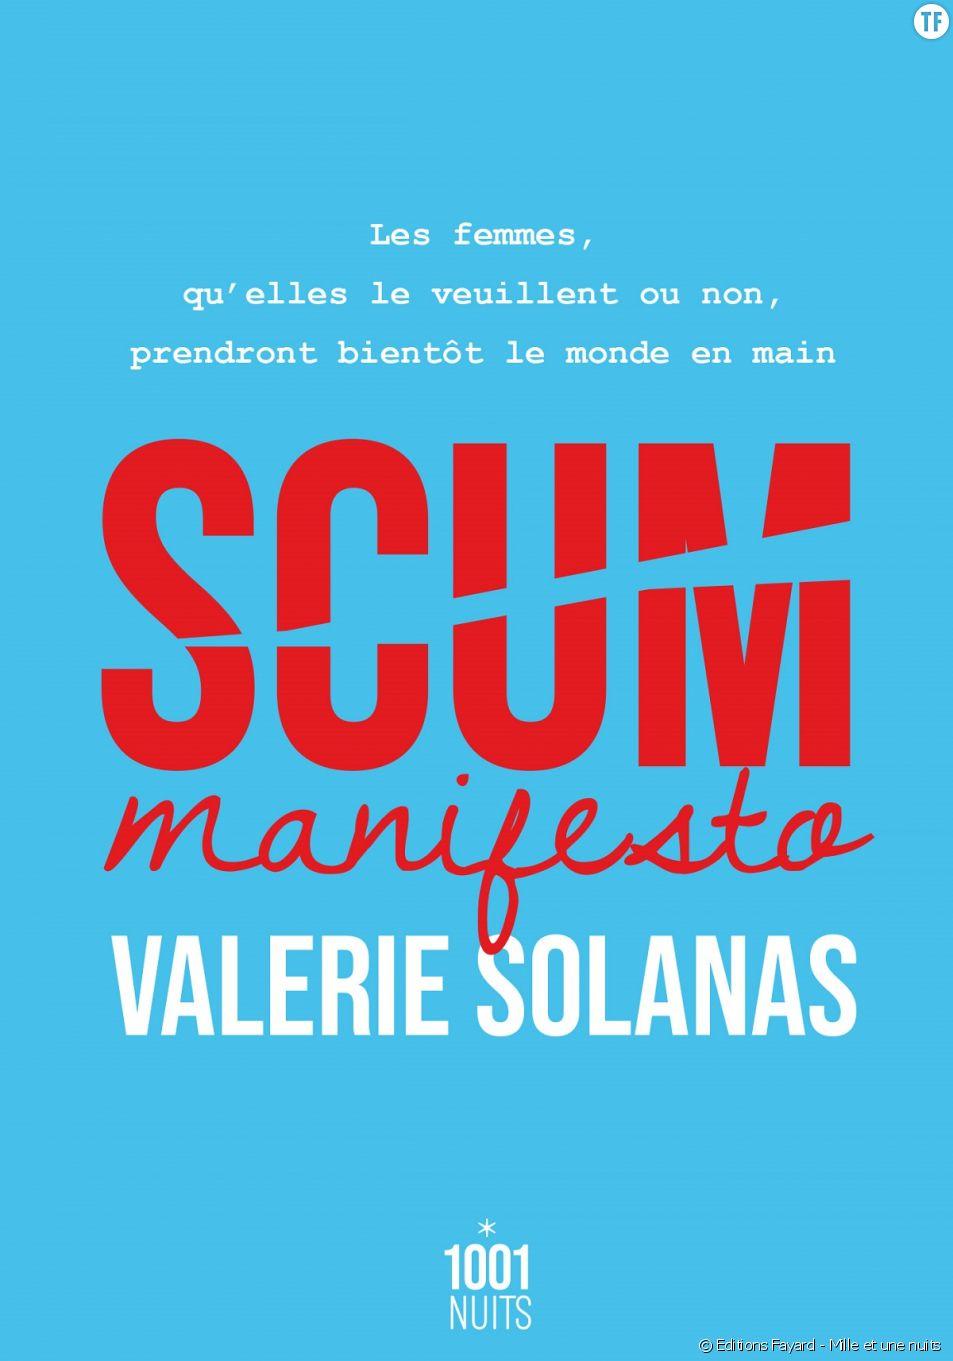 """Scum Manifesto"", lecture radicale, extrême, provocatrice... Bref : nécessaire."